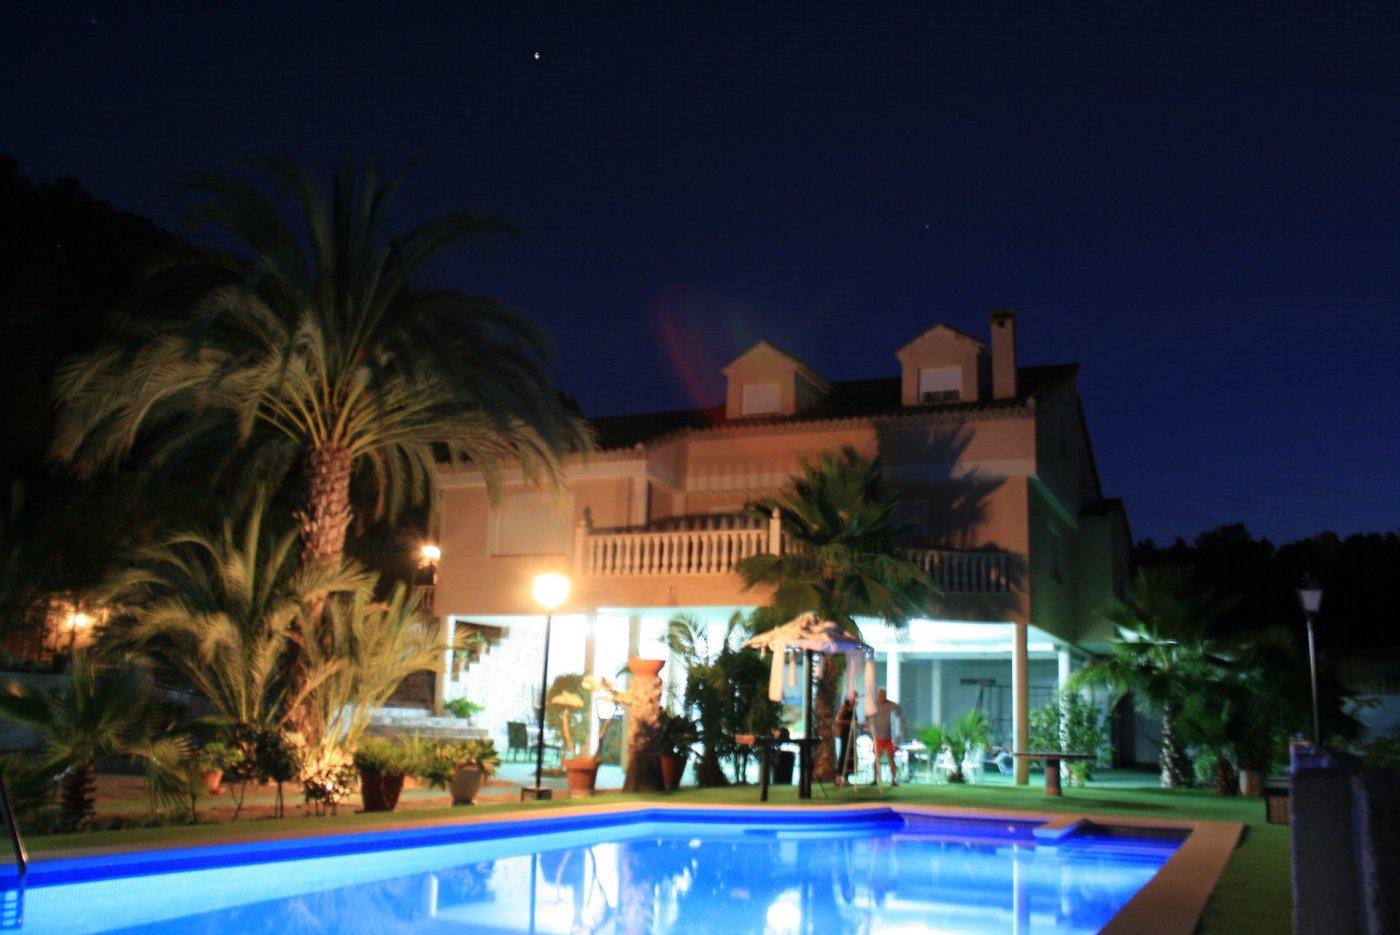 Chalet ref 3265-02767 for sale in El Palmar Spain - Quality Homes Costa Cálida